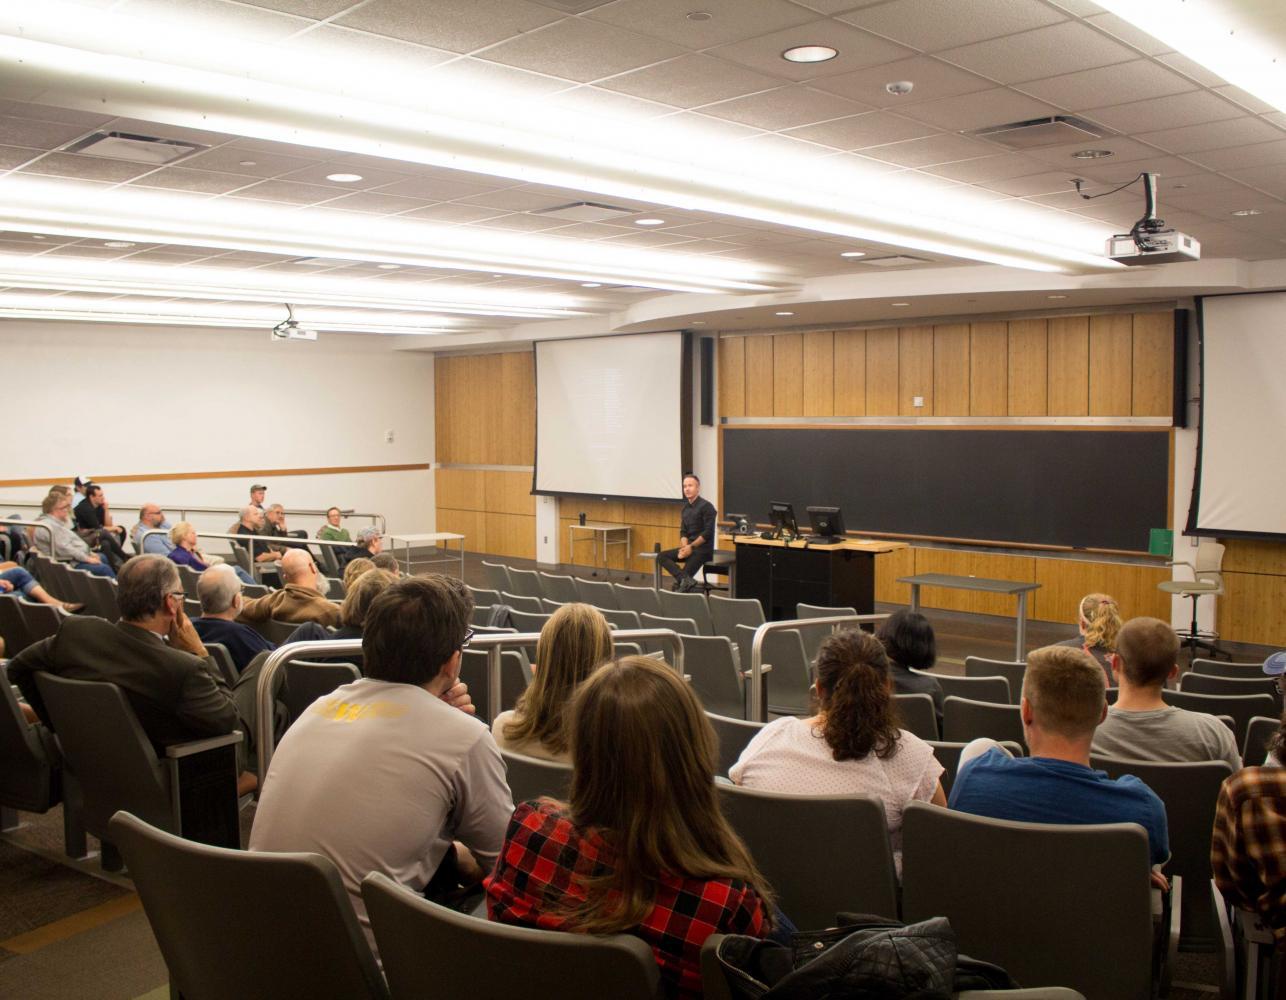 UNI alumnus Nick Schrunk had a screening of the documentary